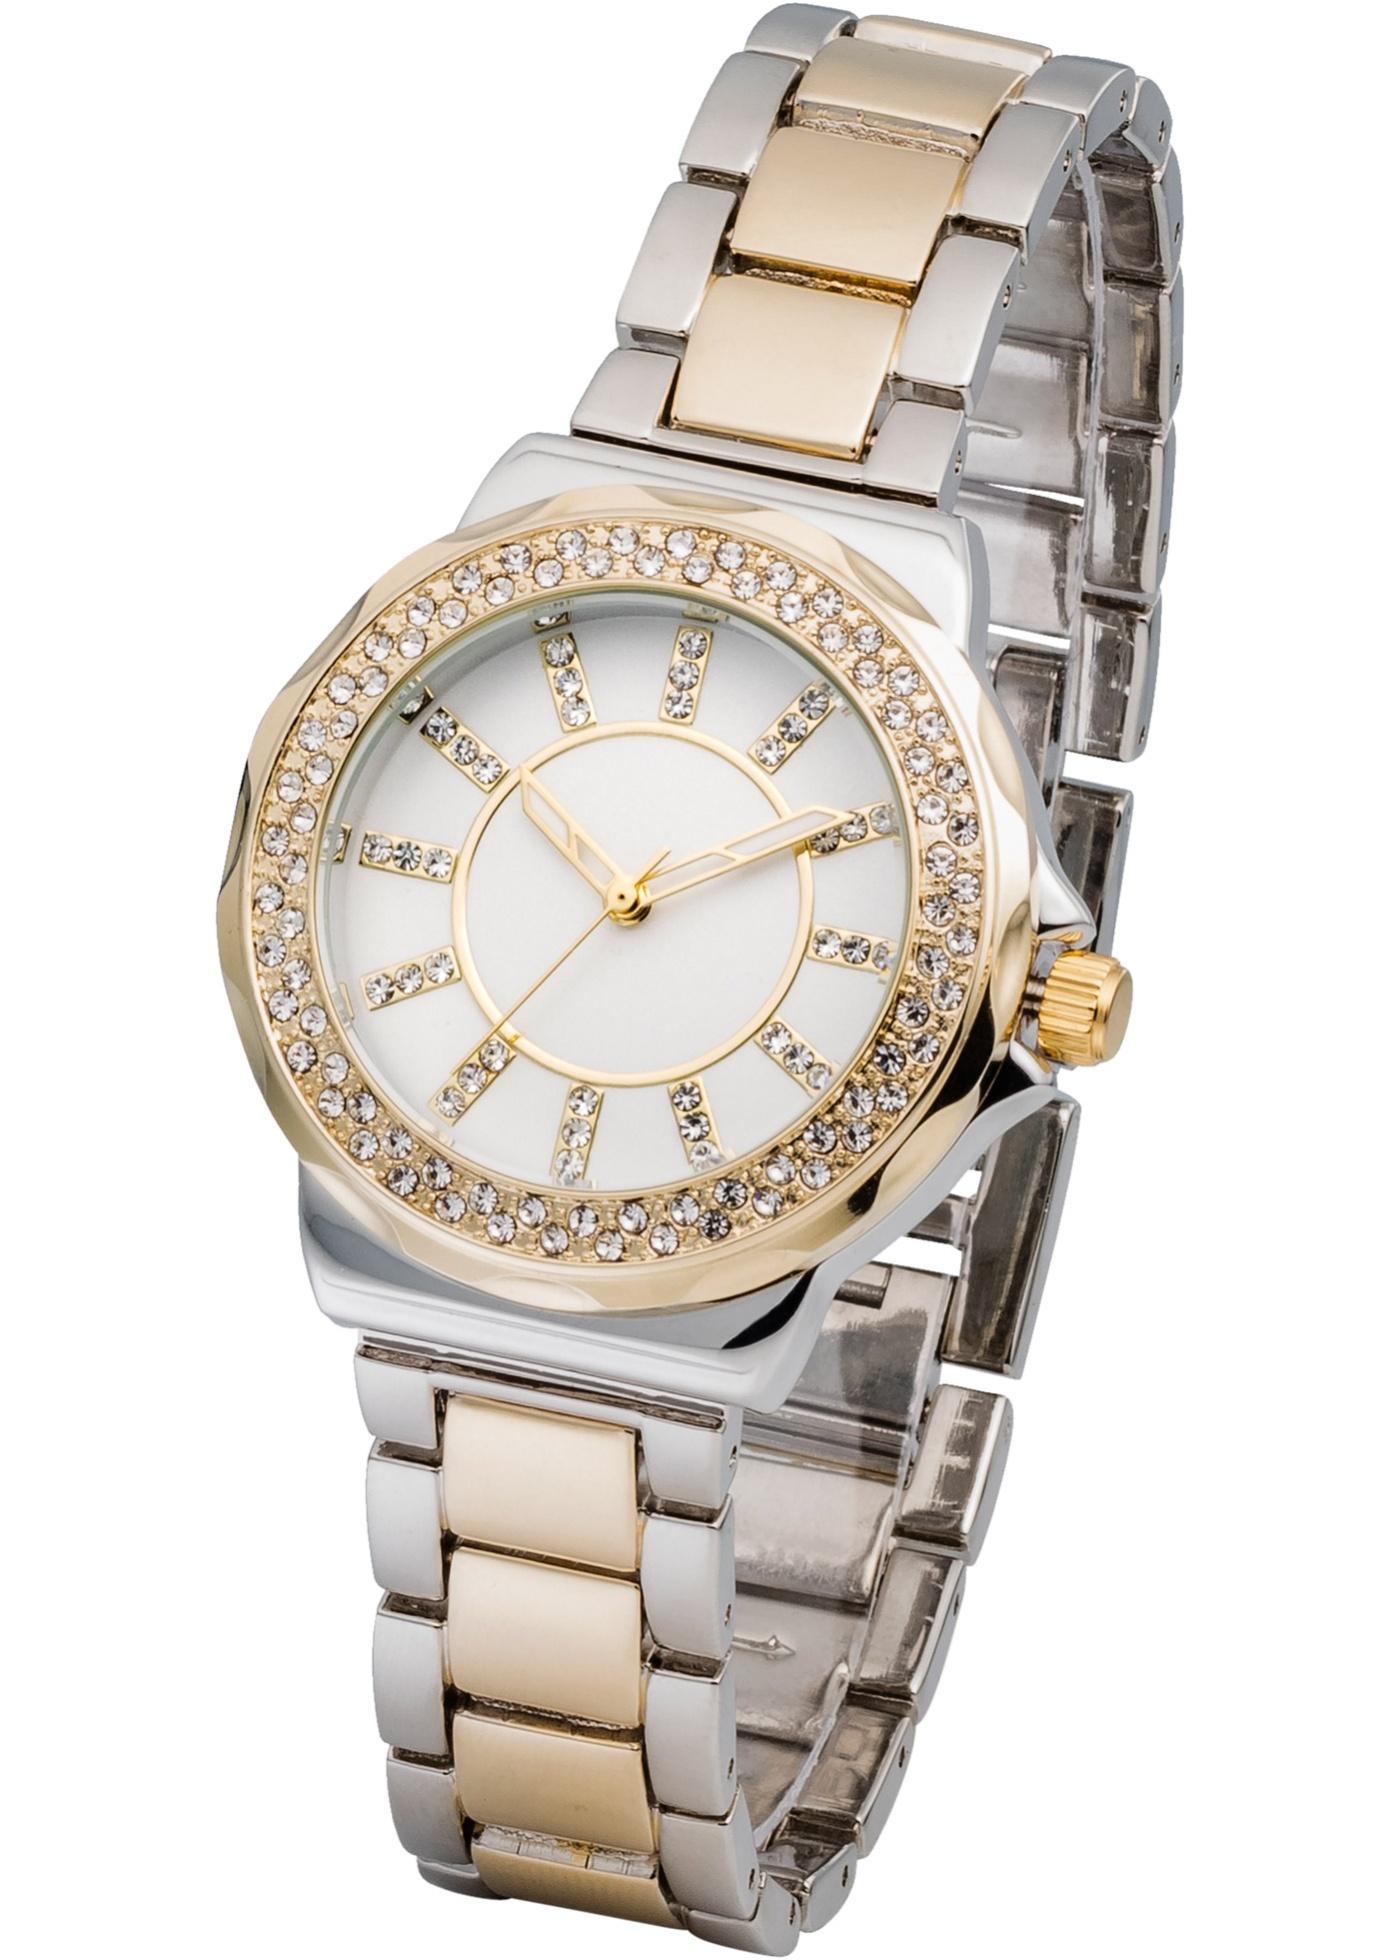 Kovové náramkové hodinky - Stříbrná 71abde3dfb